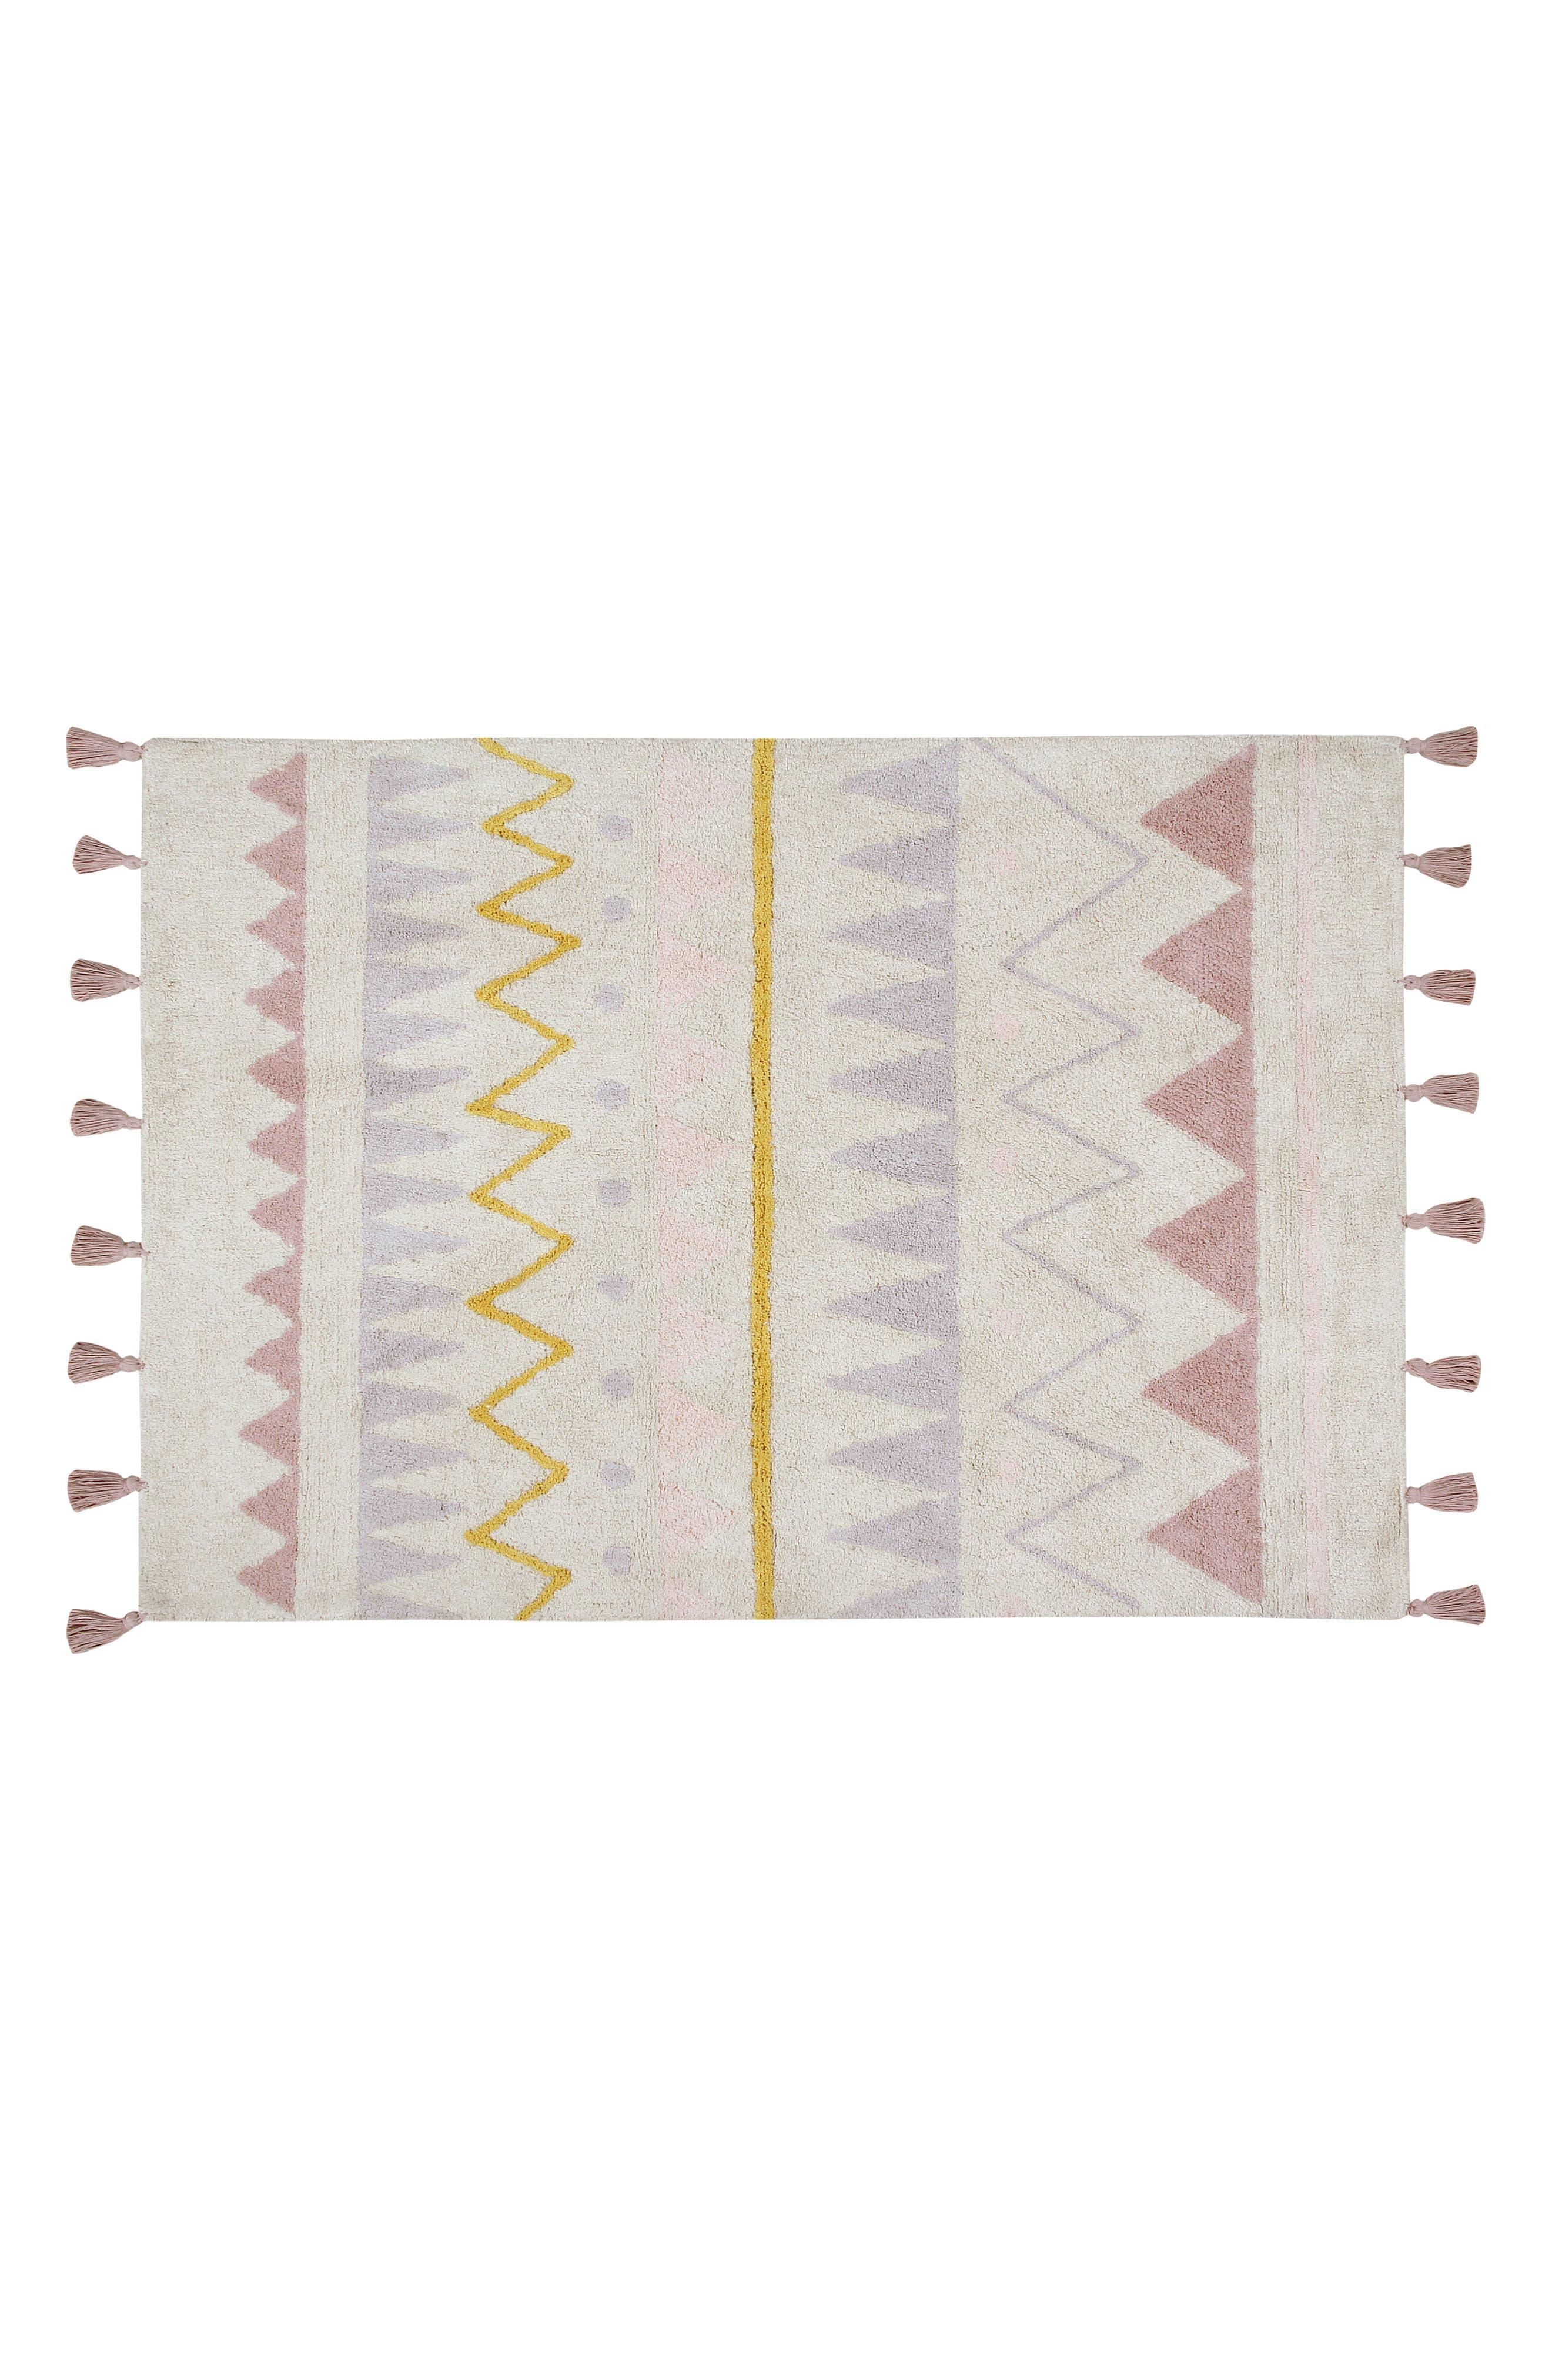 Geometric Tassel Rug,                         Main,                         color, AZTECA NATURAL-VINTAGE NUDE